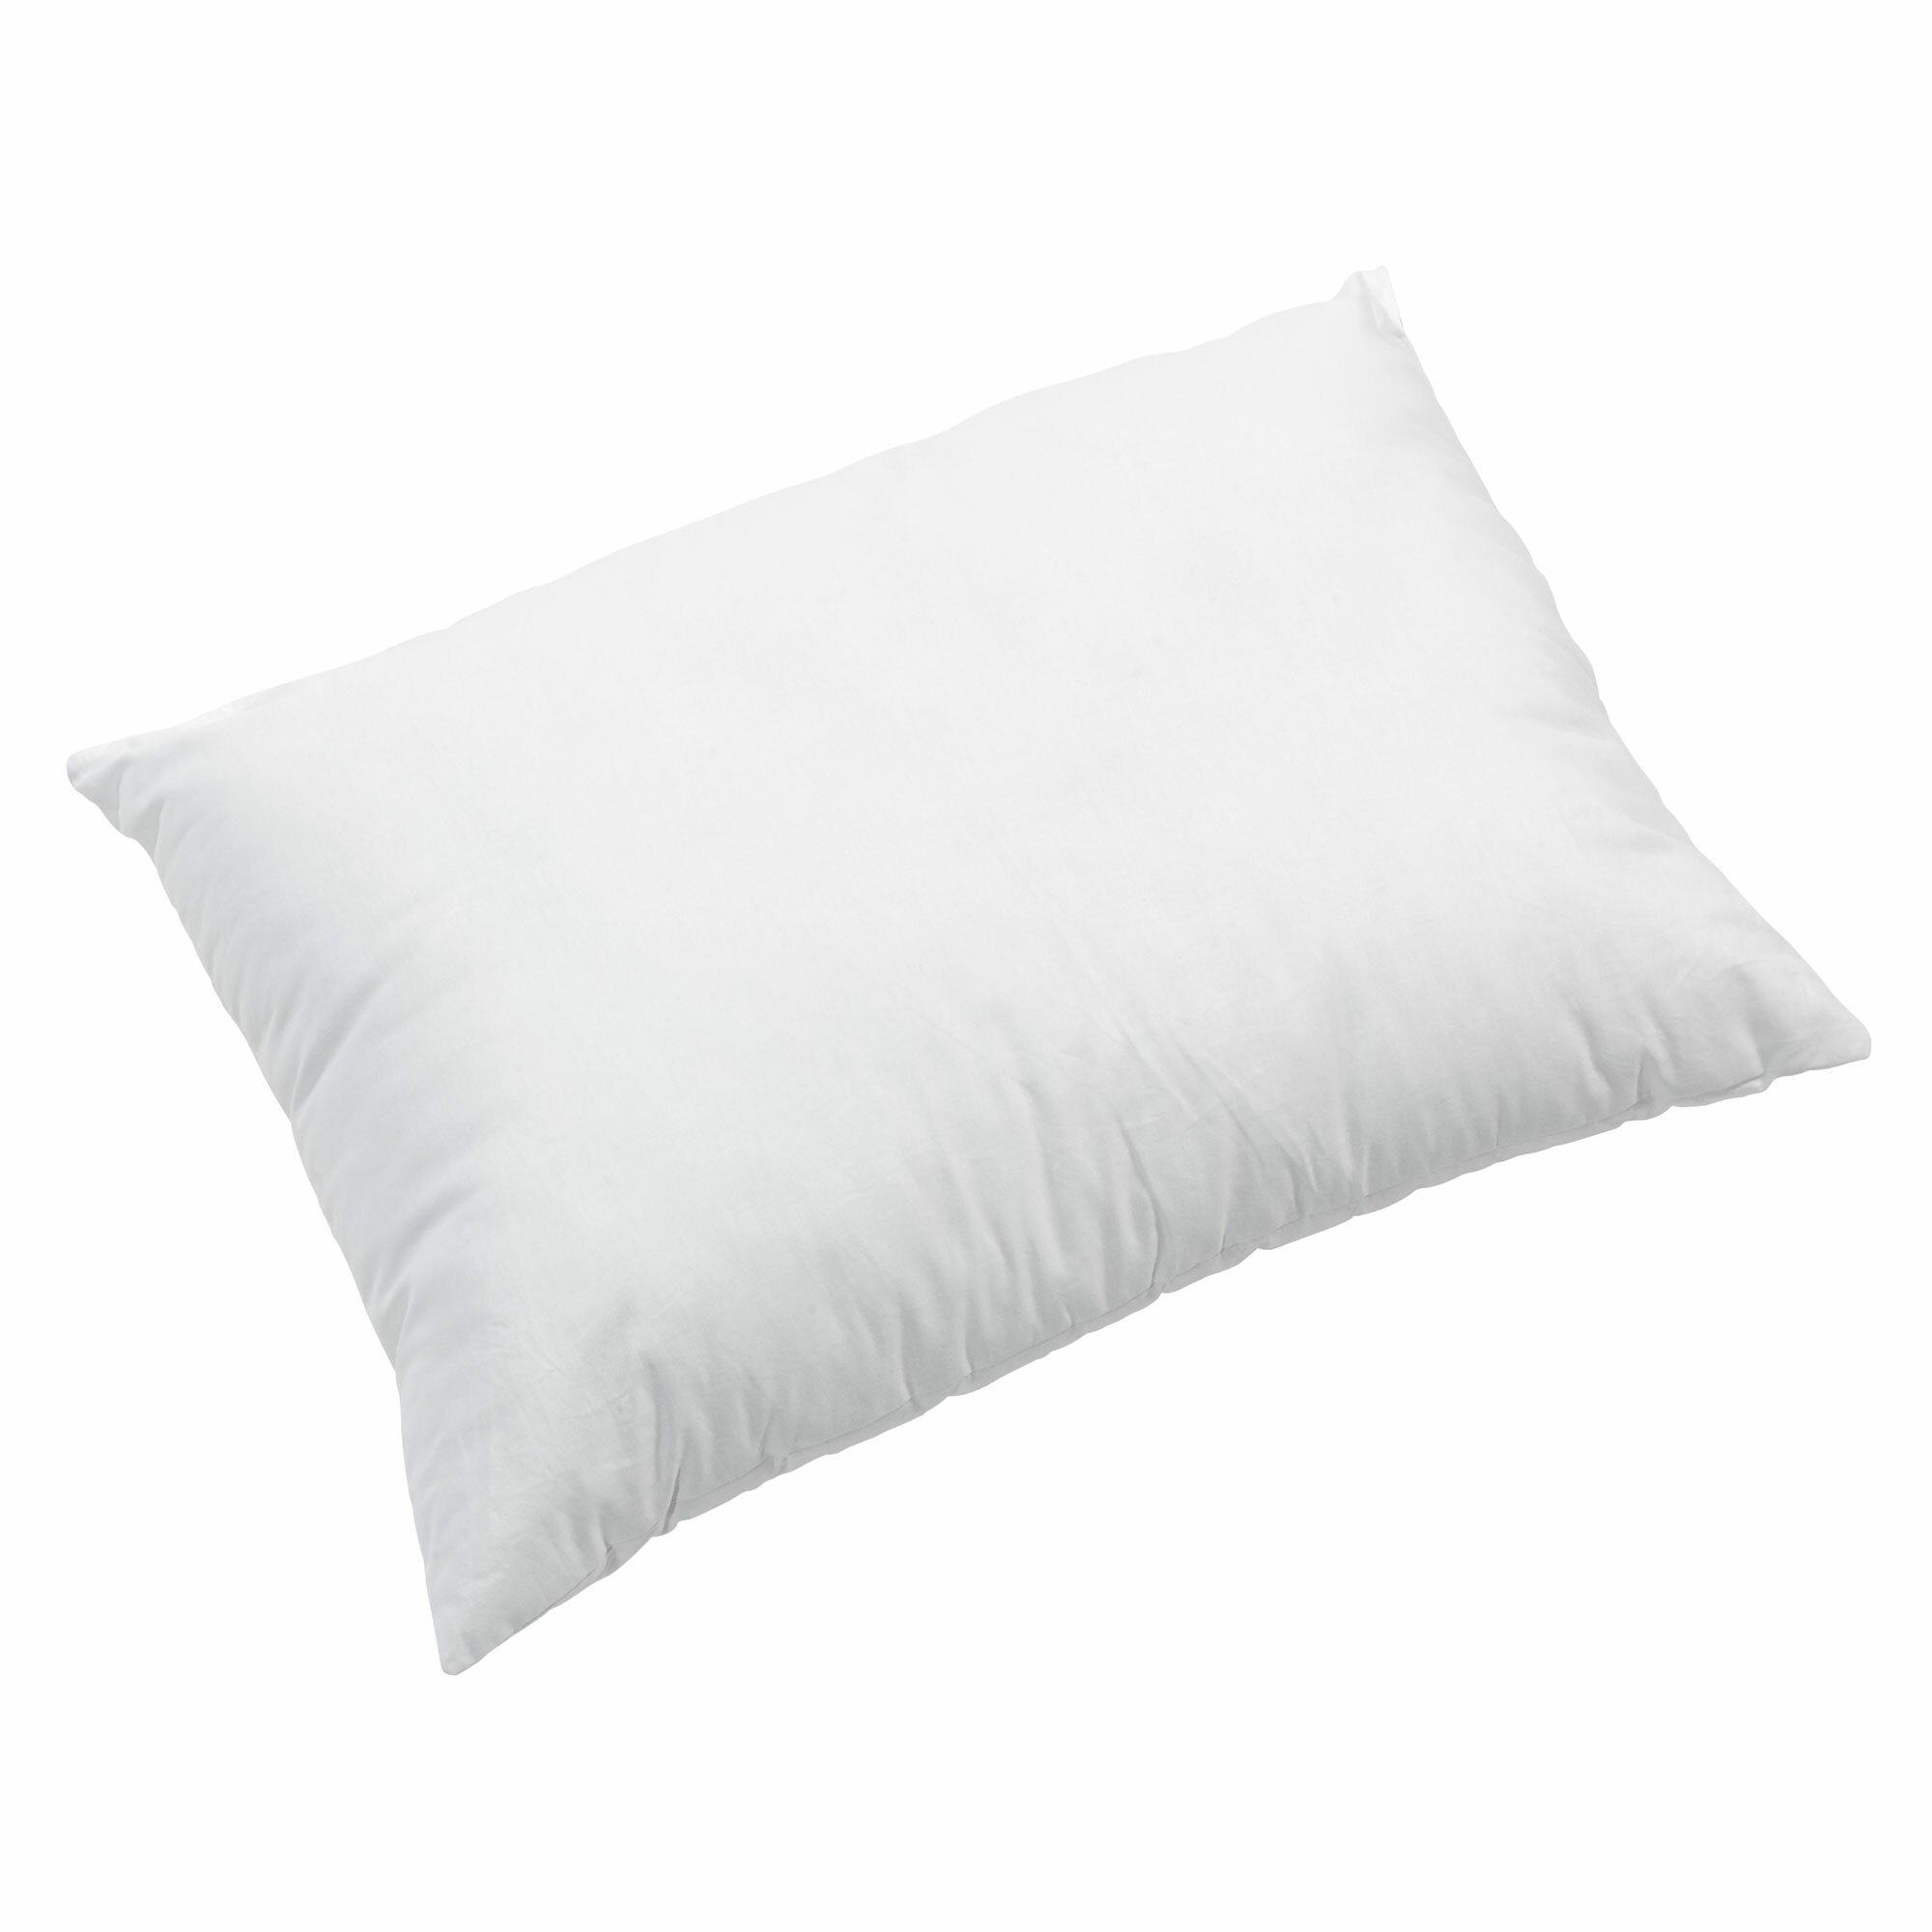 Lavish home ultra soft down alternative pillow reviews for Best soft down pillow